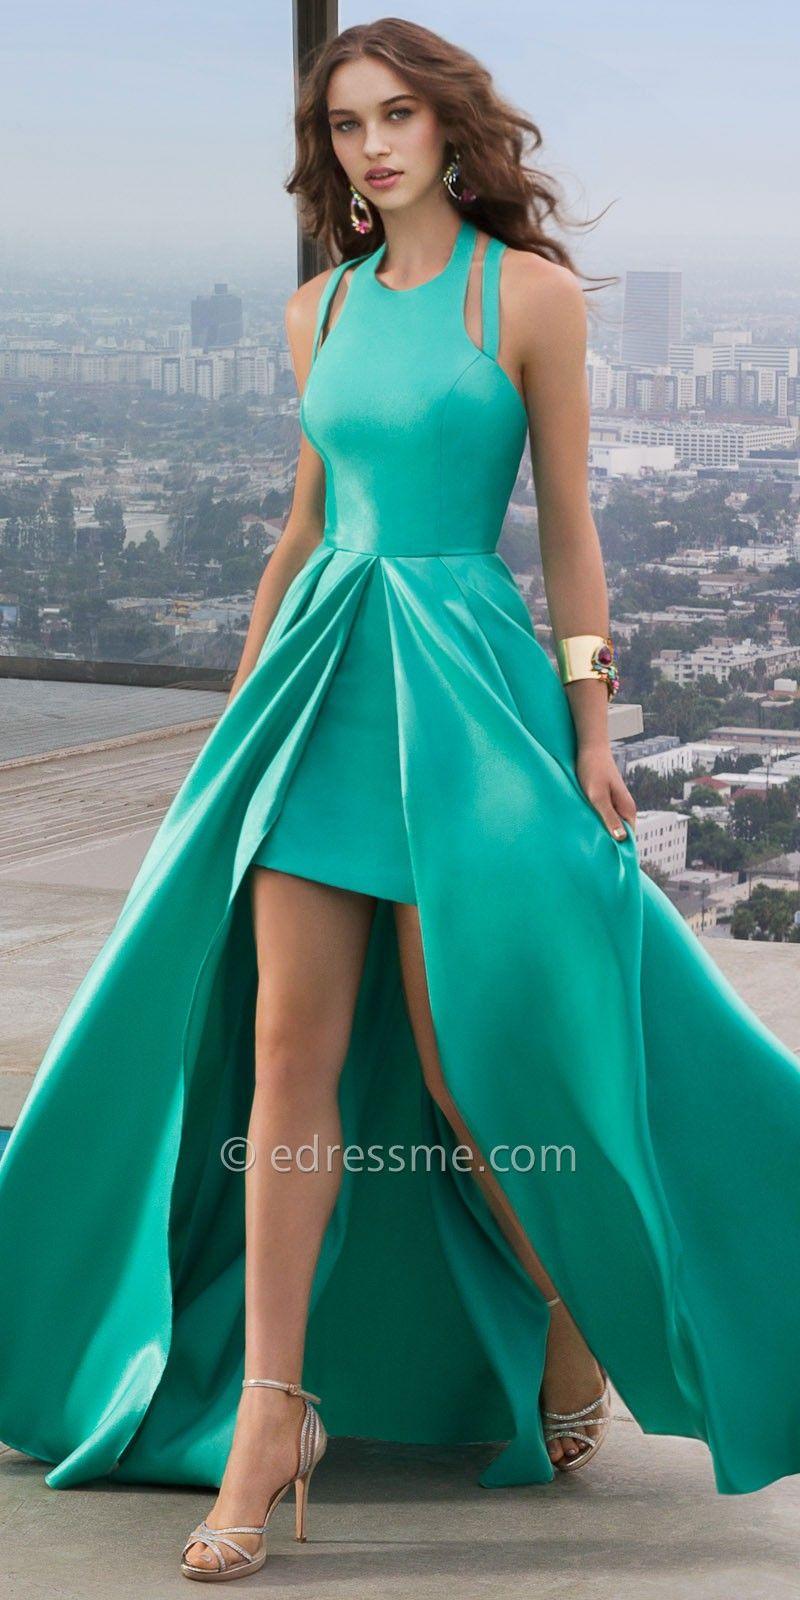 Best Informal Prom Dresses Pictures Inspiration - Wedding Ideas ...